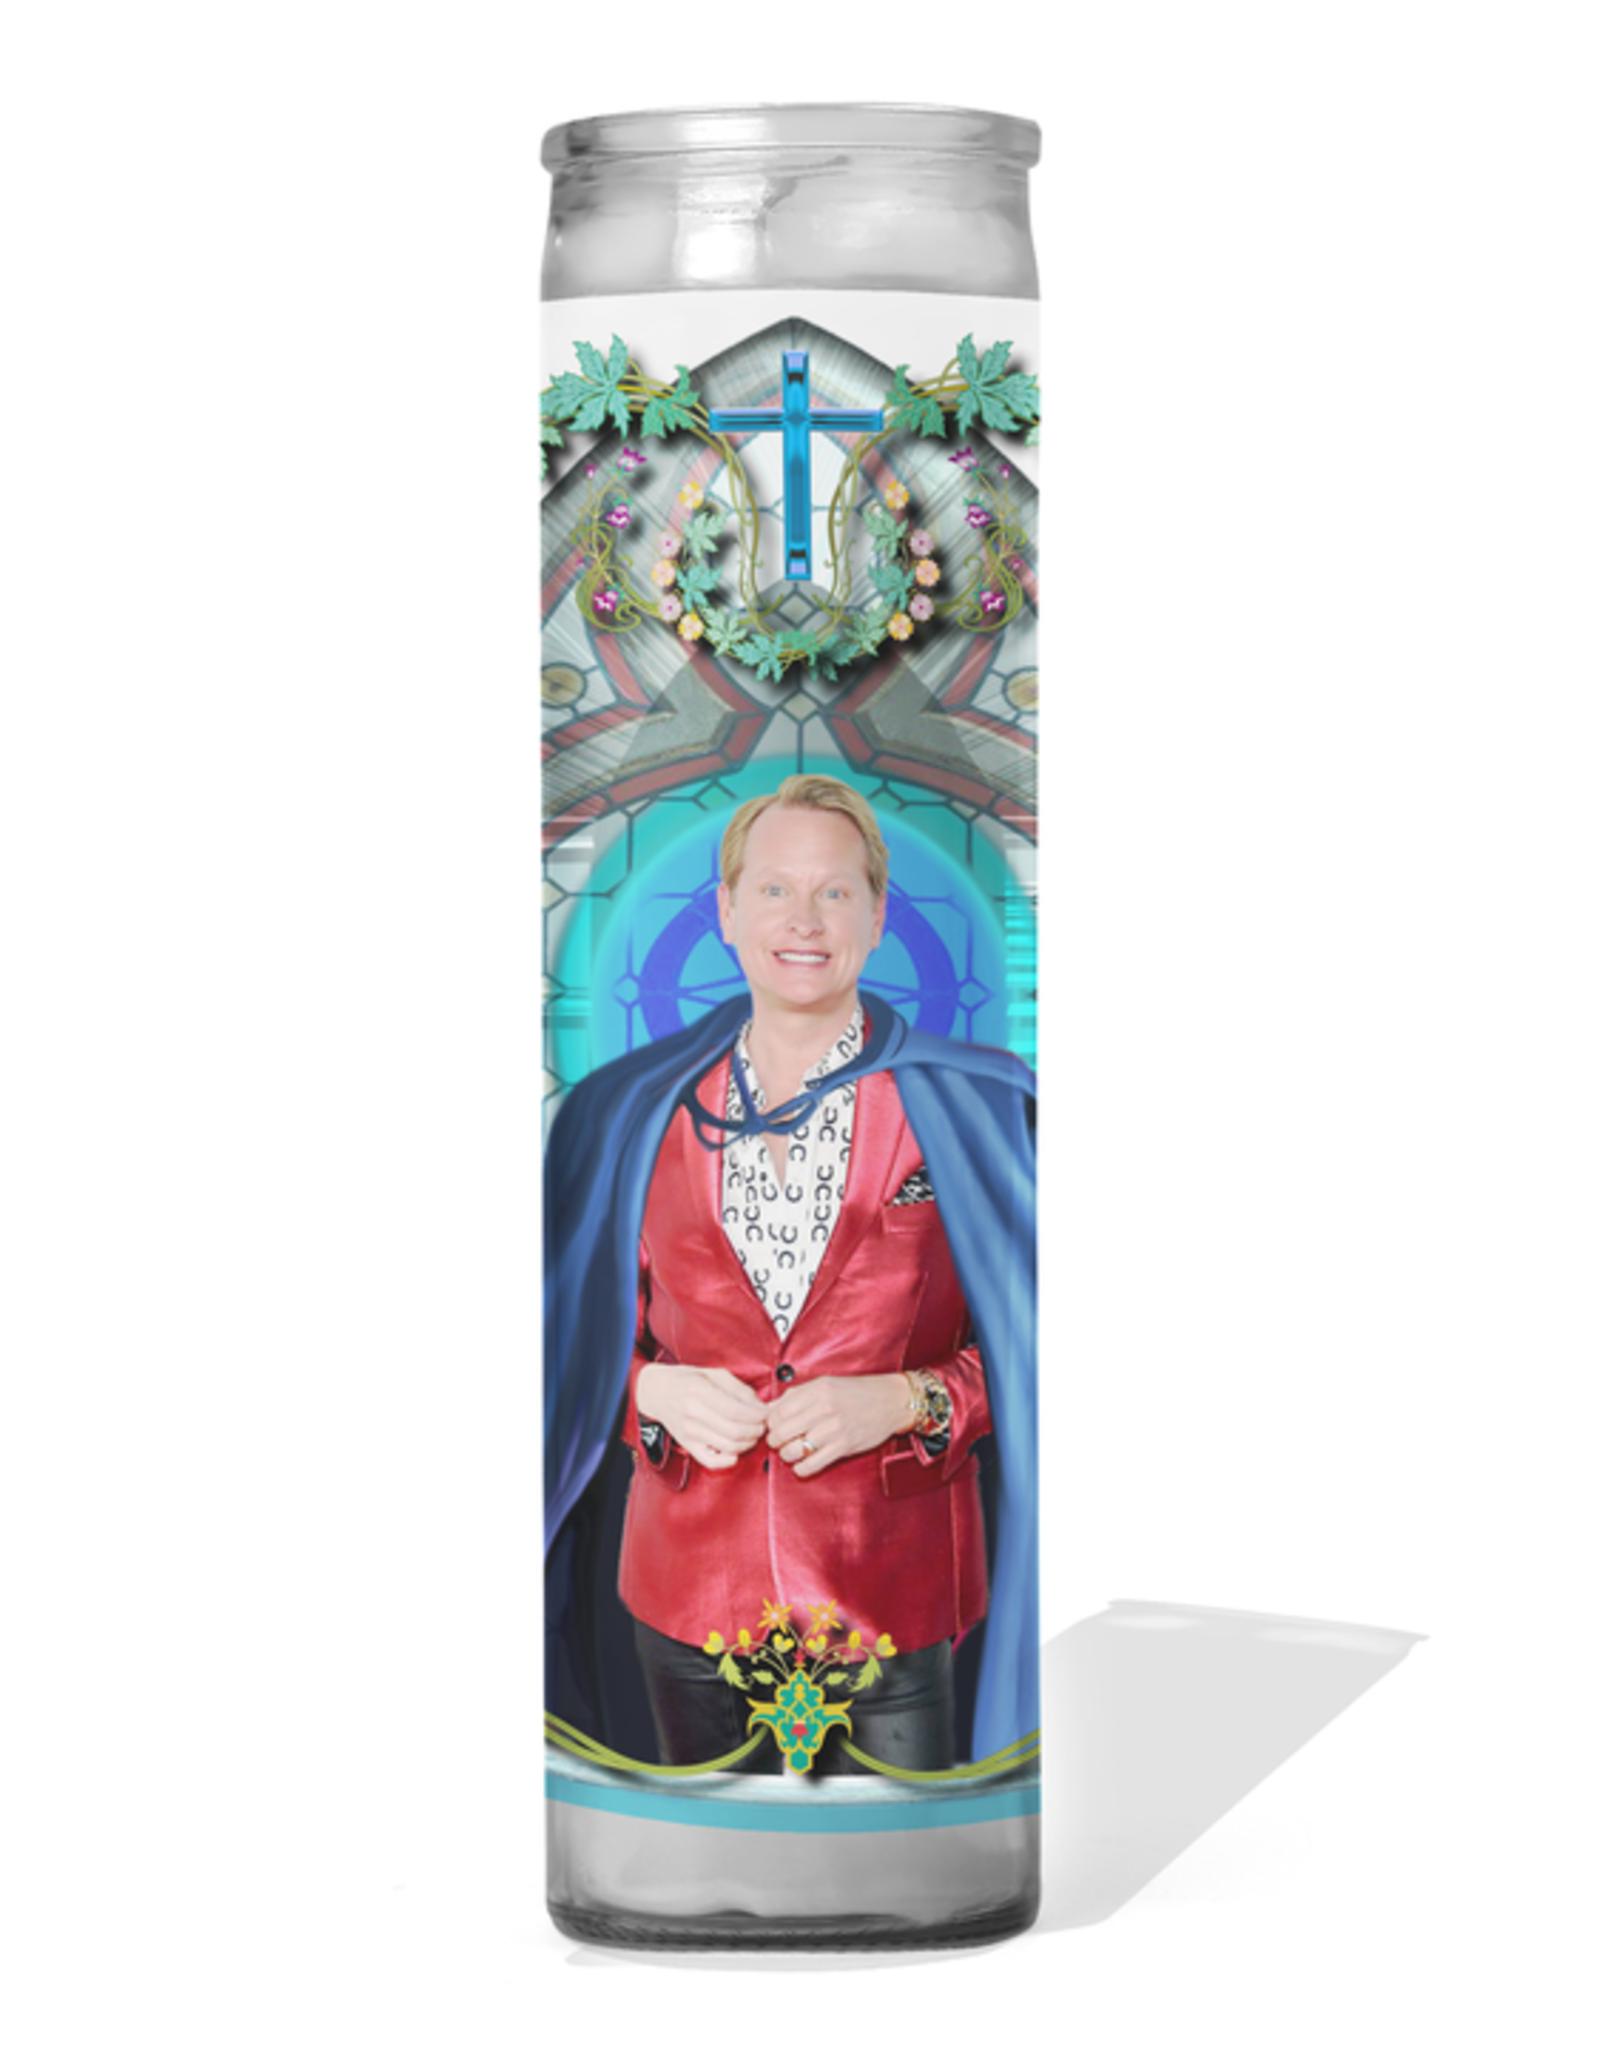 Calm Down Caren Carson Kressley Celebrity Prayer Candle